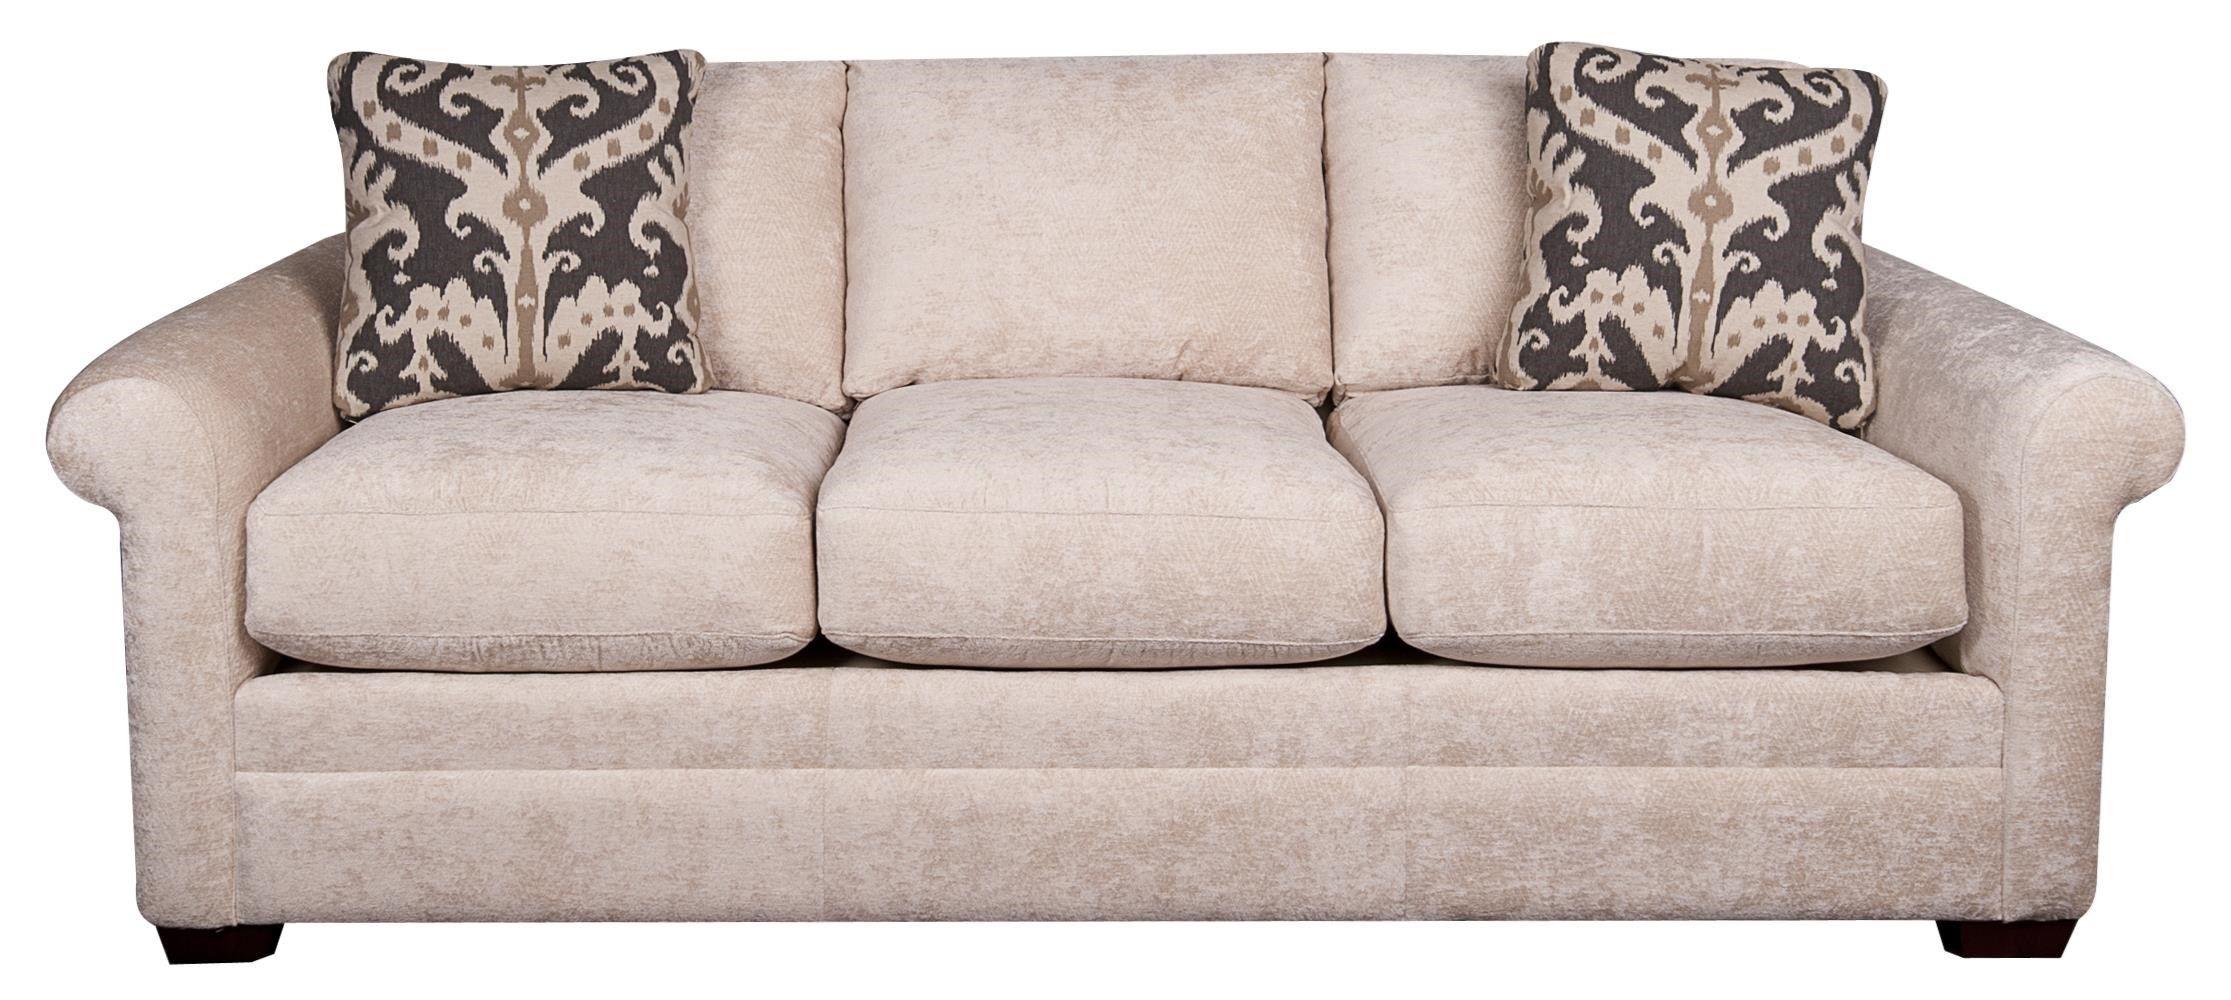 Bjorn Sofa By Craftmaster At Morris Home Morris Homes Urban Loft Mattress Furniture